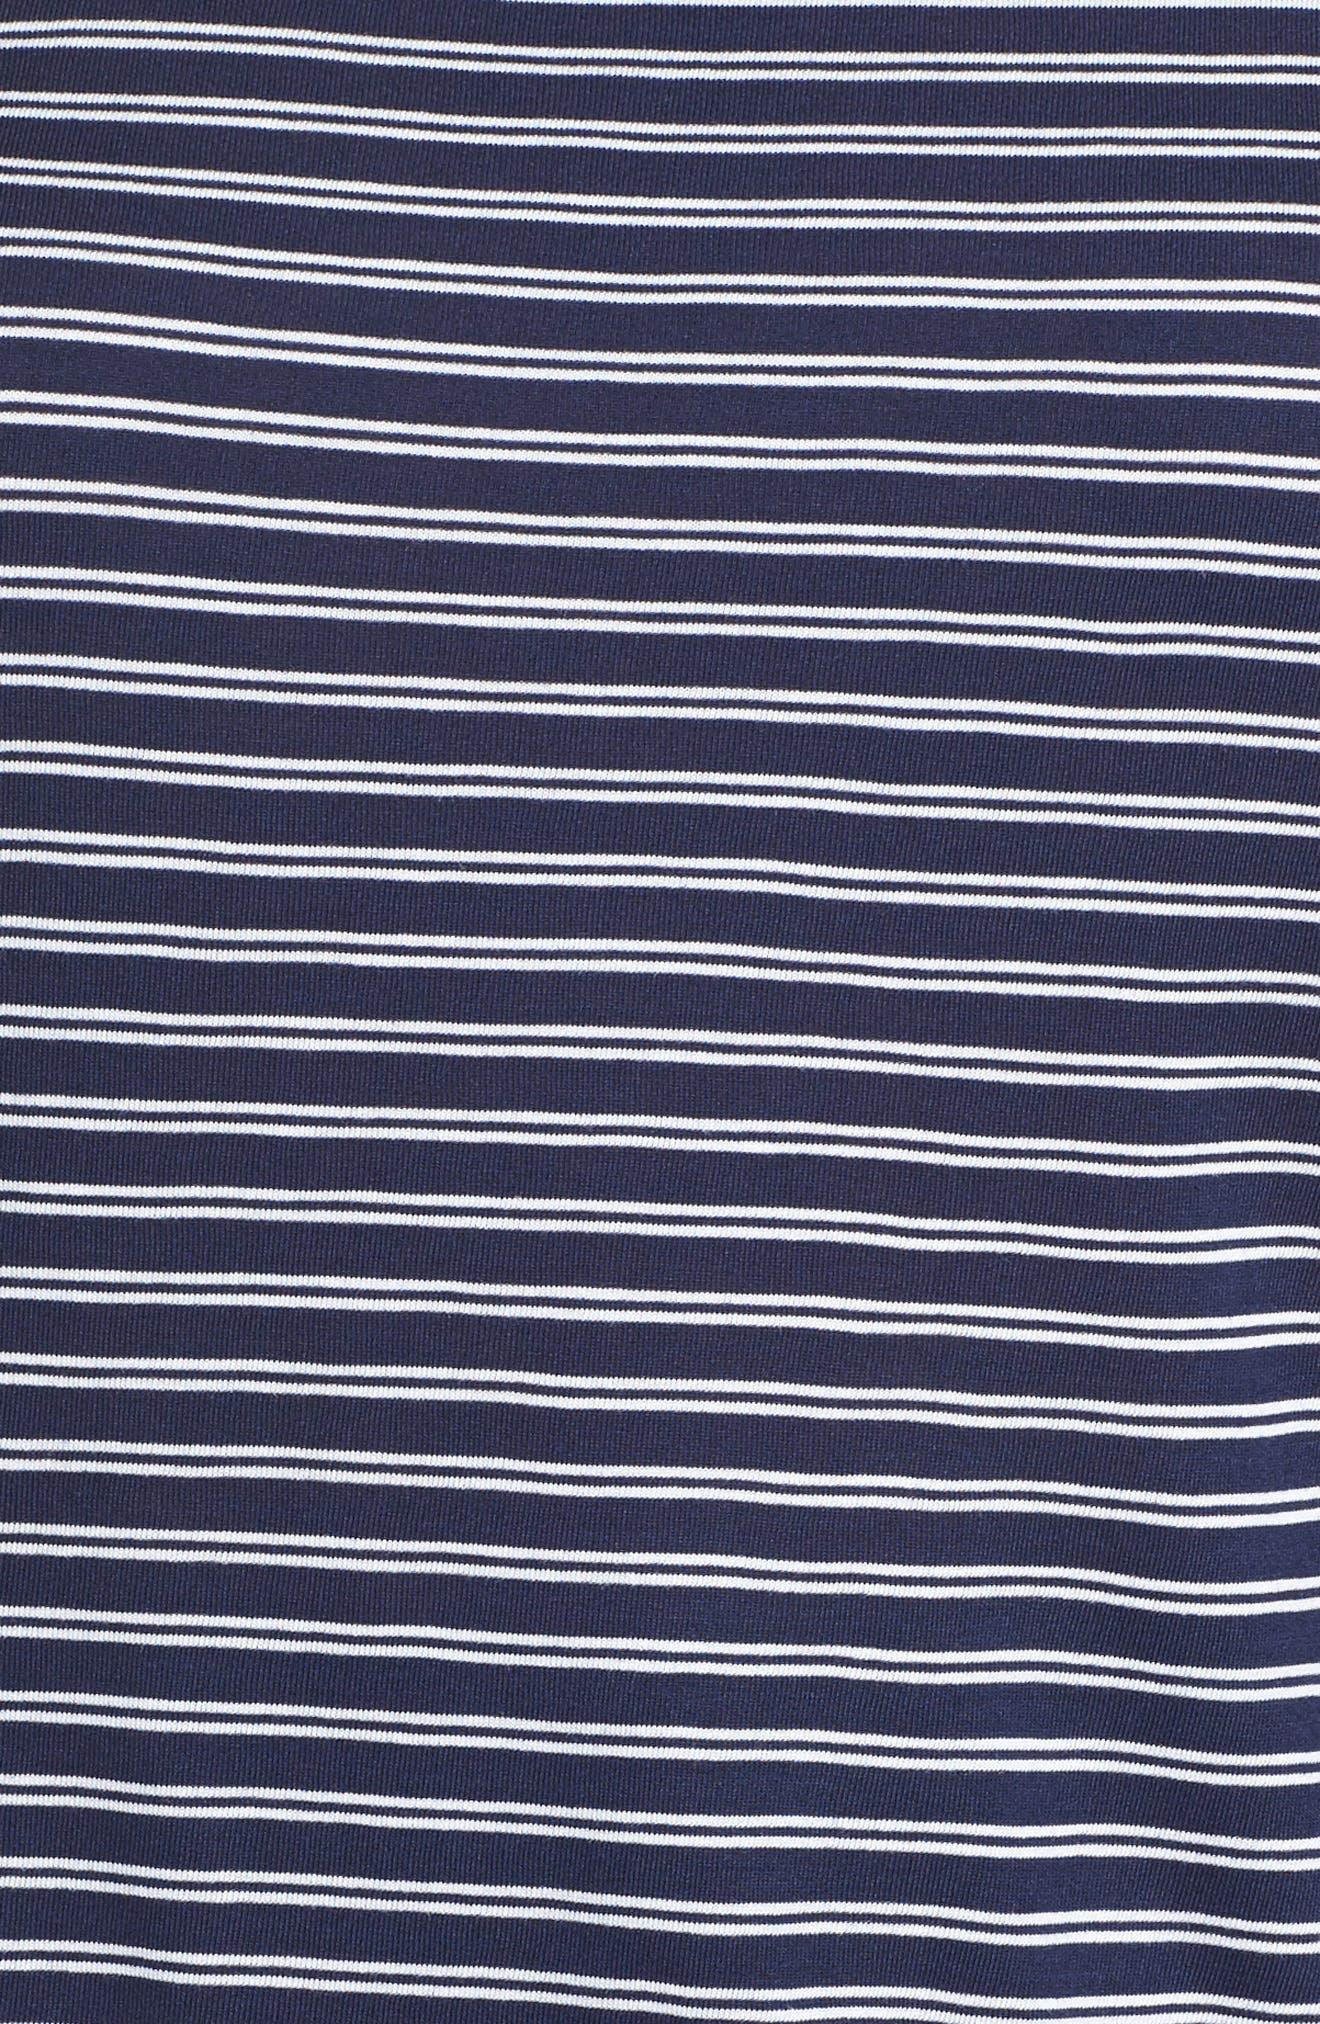 Stripe Cross Back Tee,                             Alternate thumbnail 5, color,                             Navy- White Cori Stripe